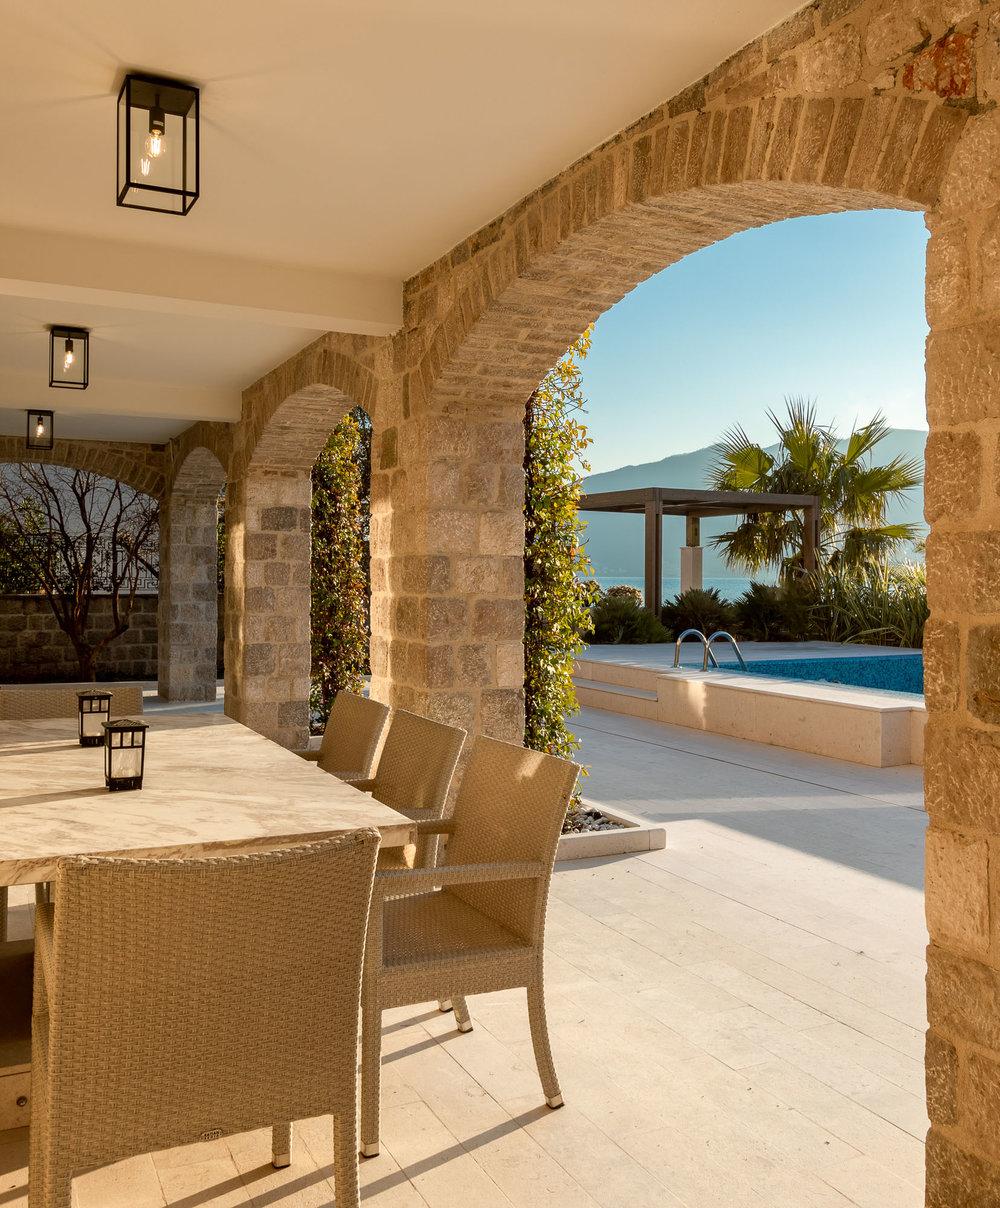 Sunset-view-terrace-stone-villa-bay-of-kotor.JPG